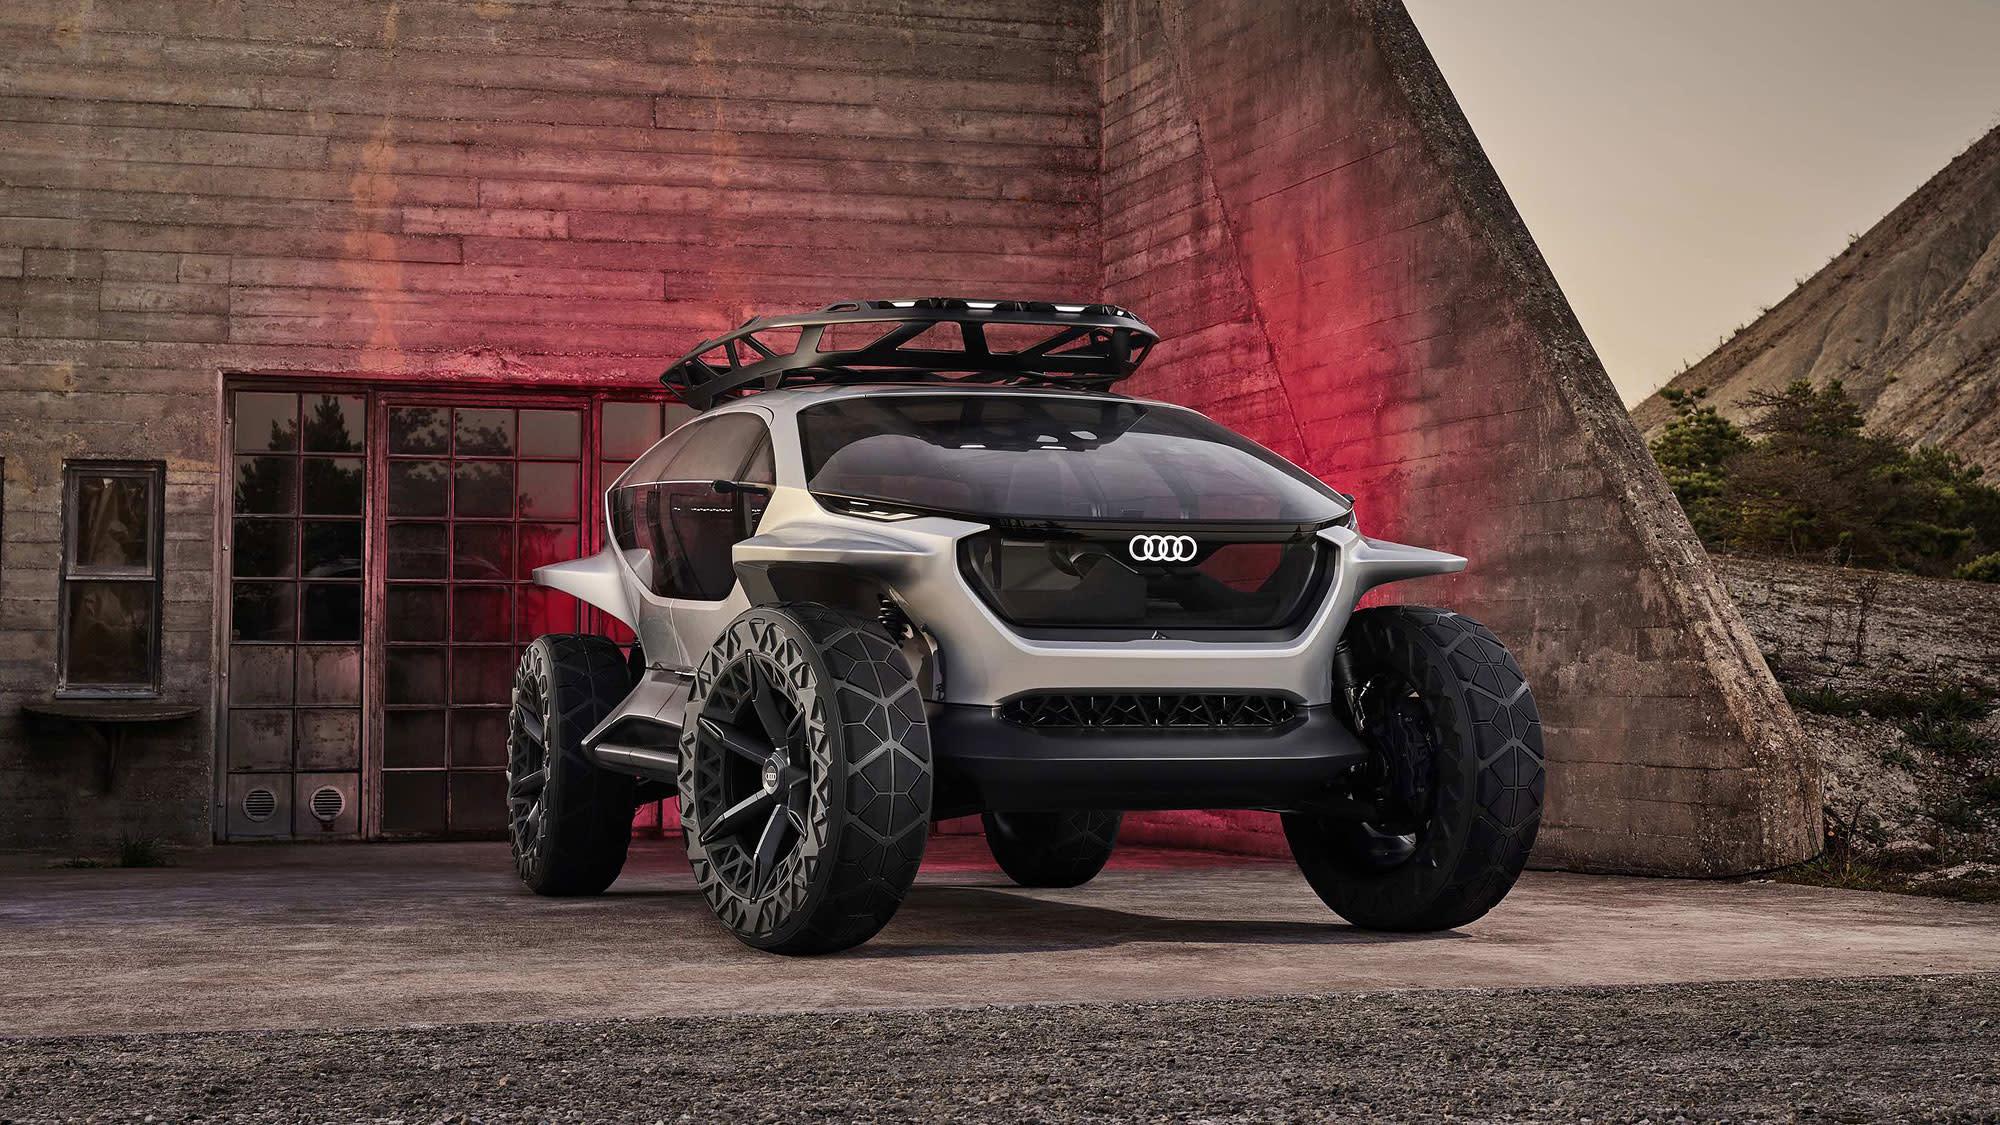 Audi AI:Trail quattro 純電越野概念亮相,擘劃征服地表野望